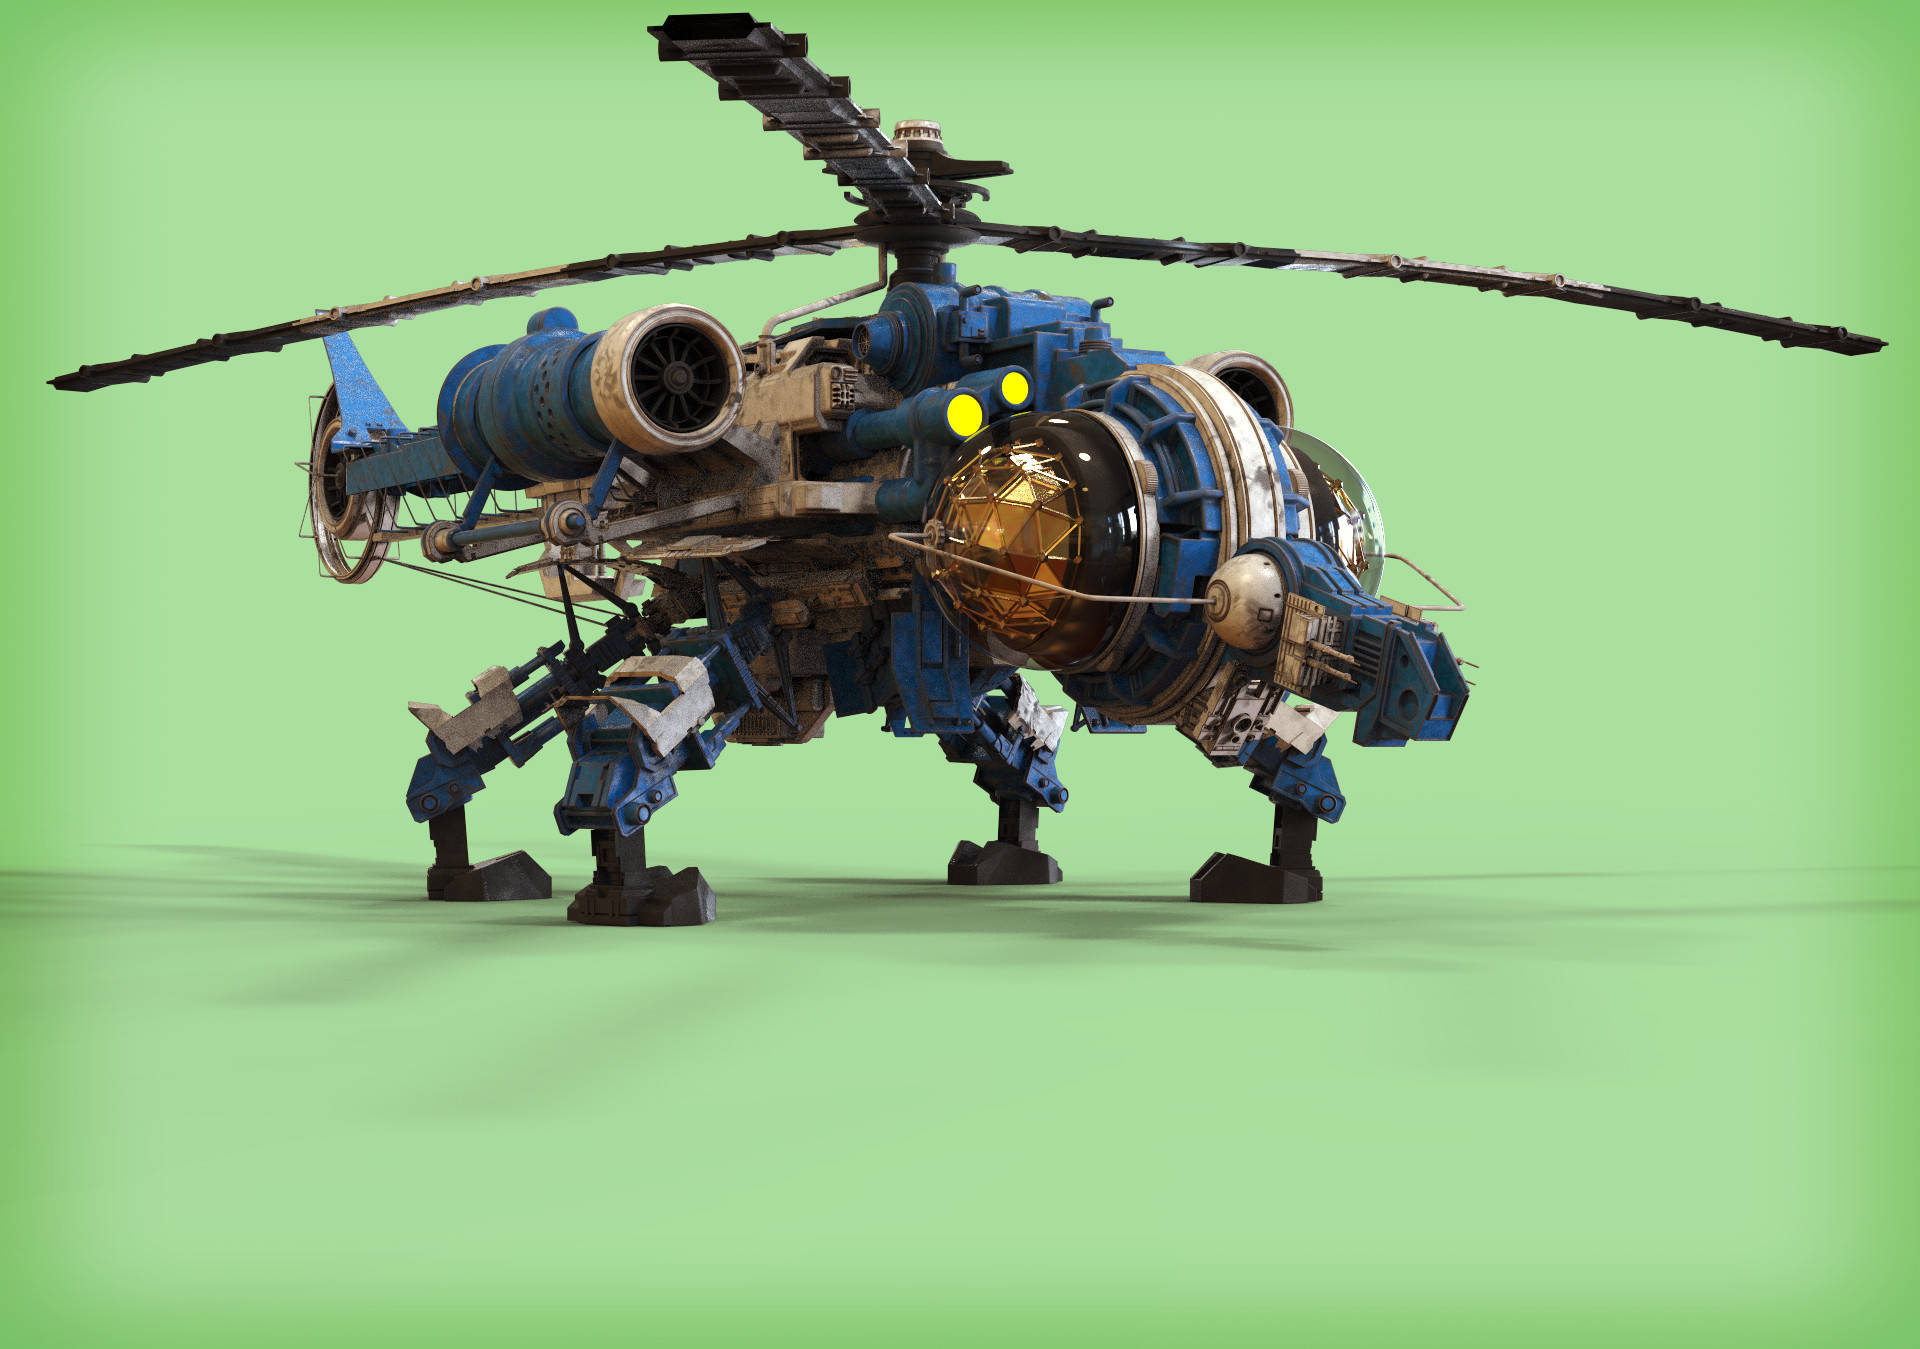 Ben nicholas bughelicopter 08